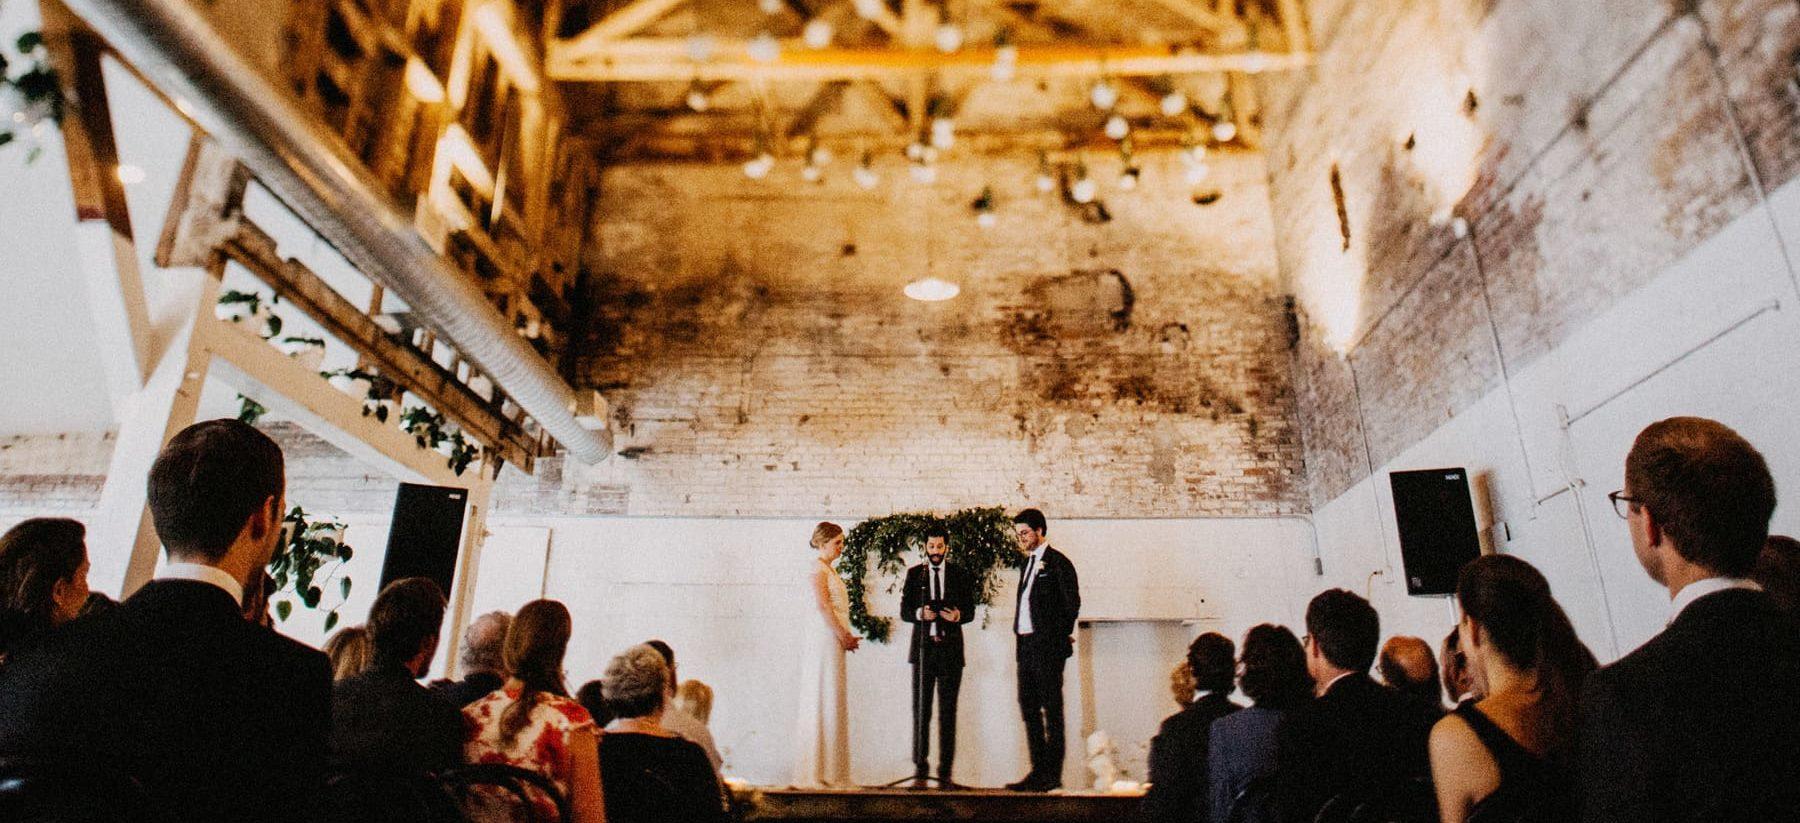 Wedding Venues In Oregon.Top 25 Portland Wedding Venues Updated For 2019